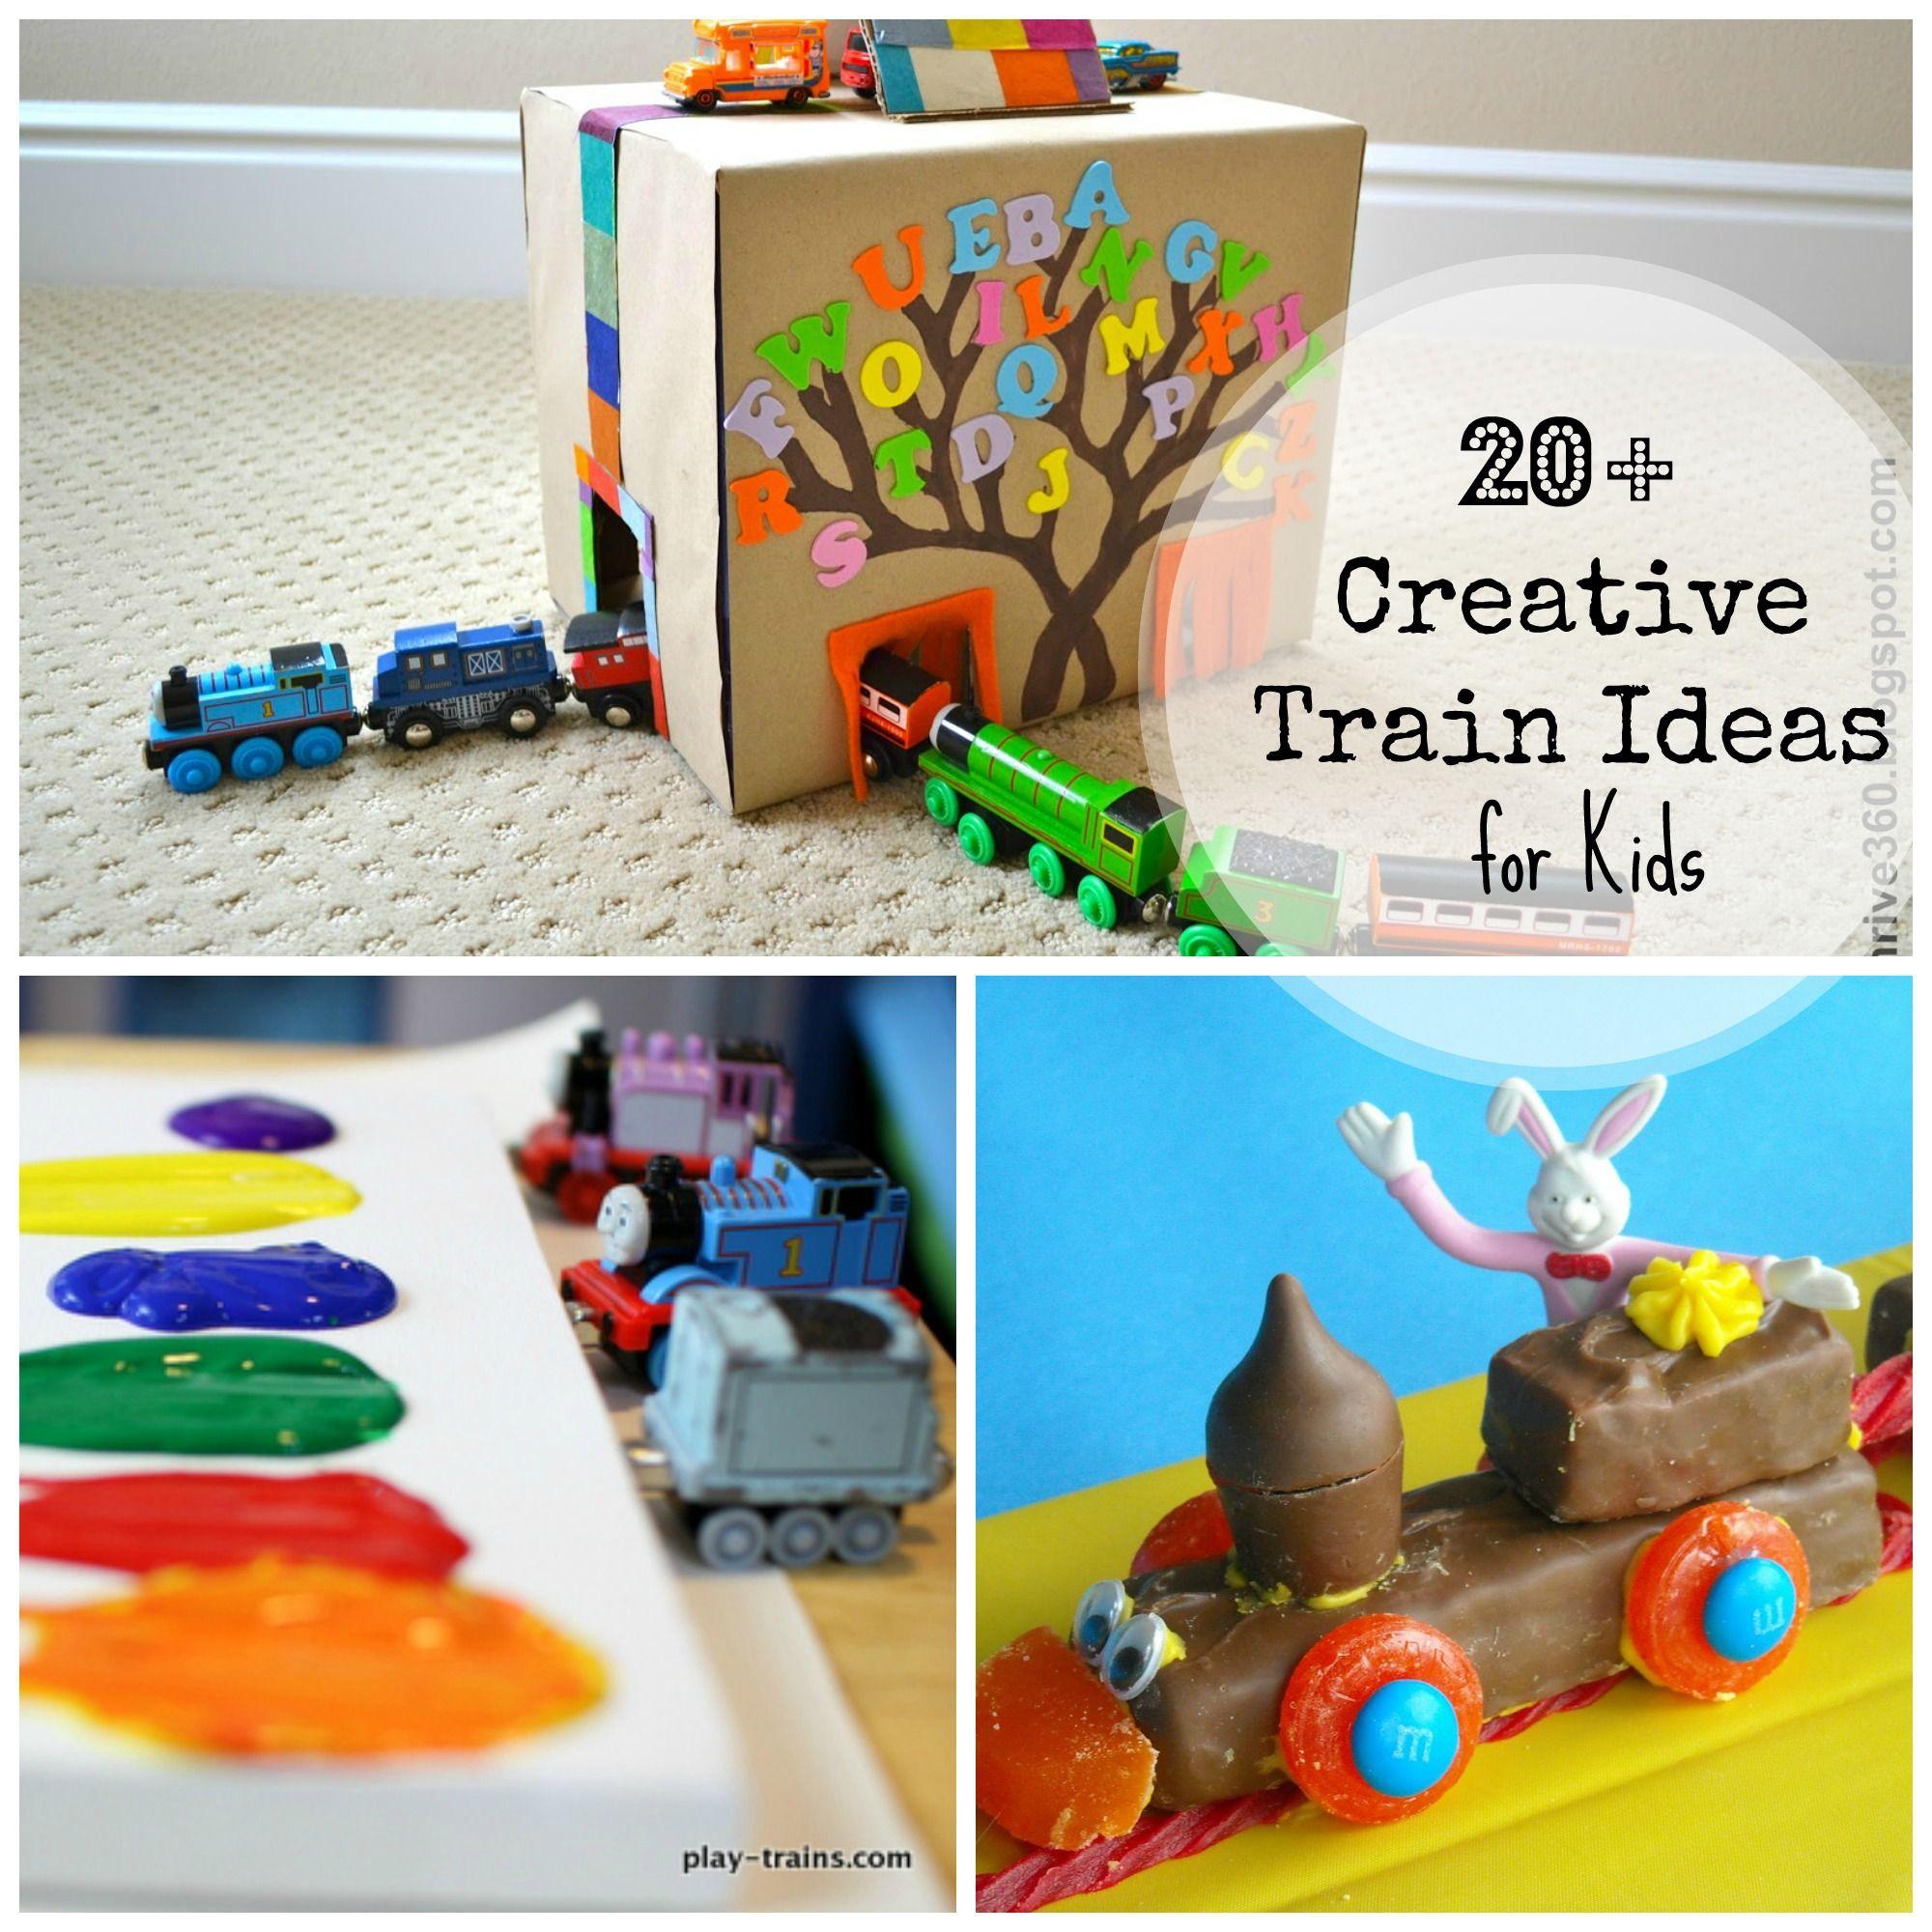 All Aboard 20 Creative Train Ideas For Kids